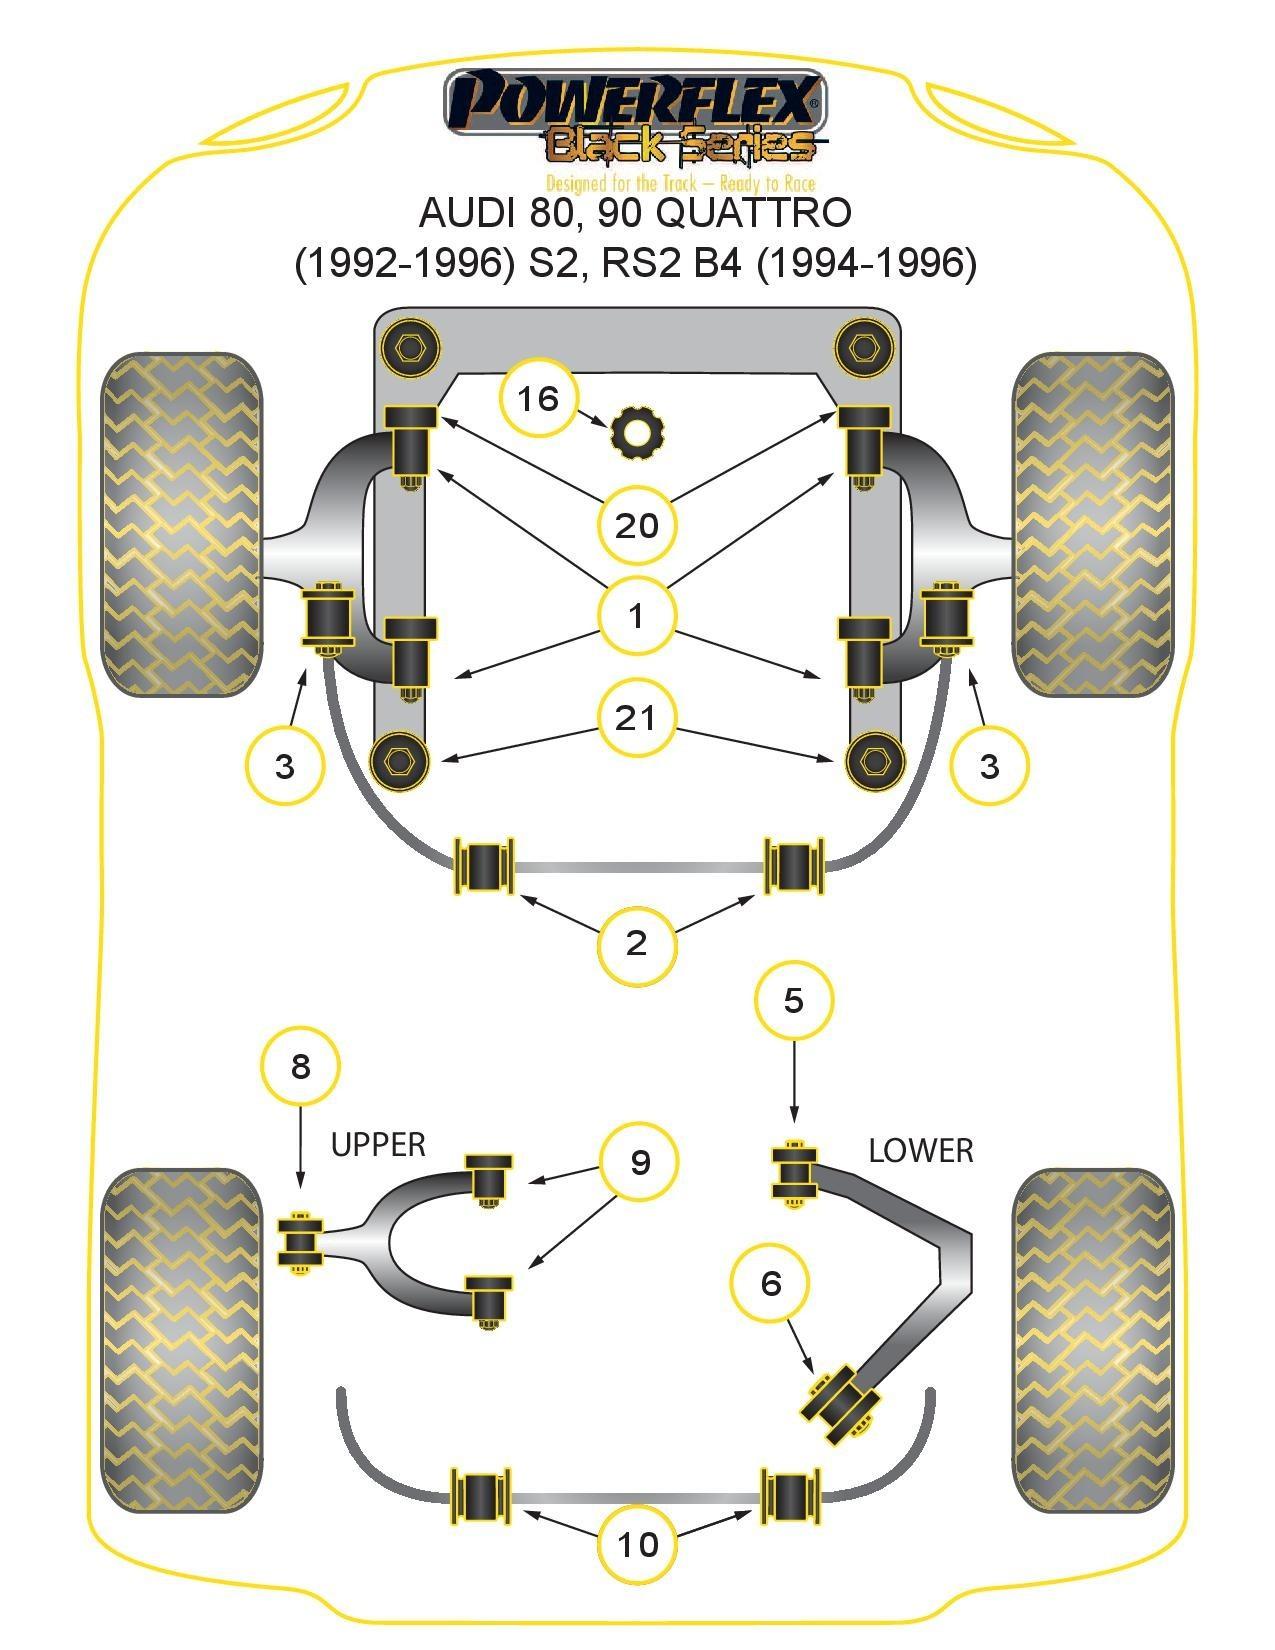 Rear Car Suspension Diagram Powerflex Bushes for Audi 80 90 Quattro Inc Avant 1992 1996 S2 Of Rear Car Suspension Diagram